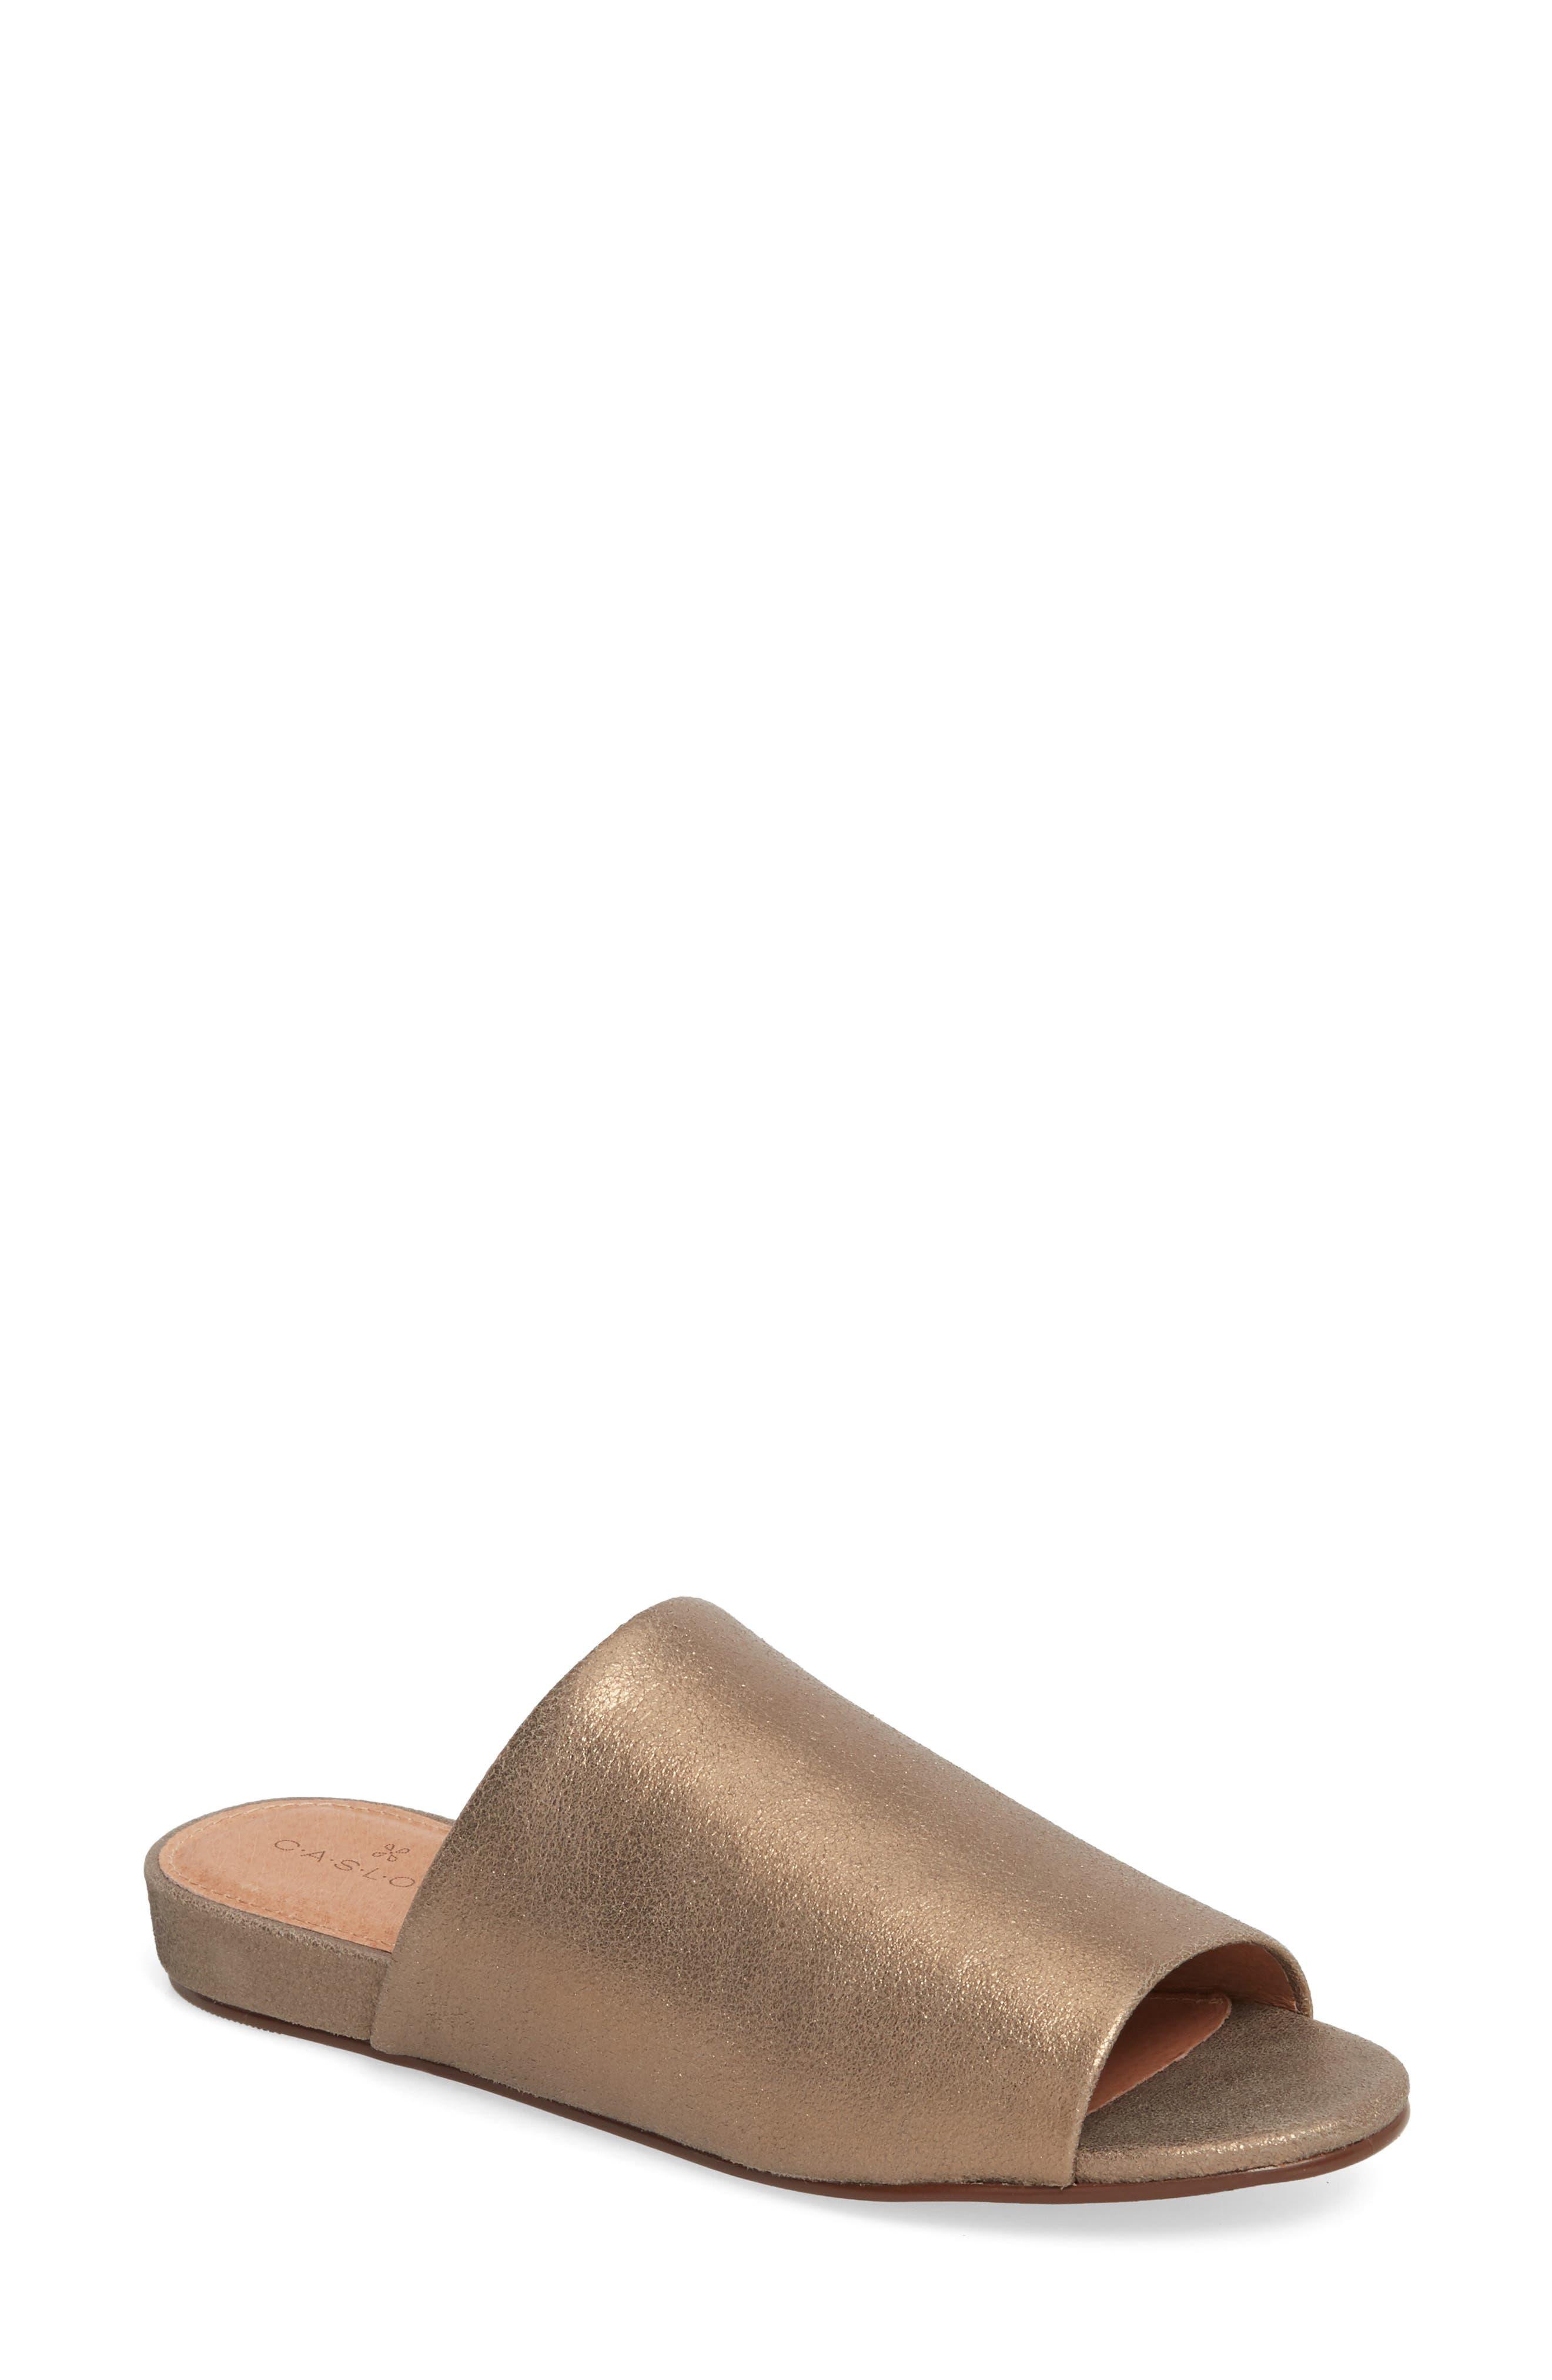 Main Image - Caslon® Kiana Slide Sandal (Women)